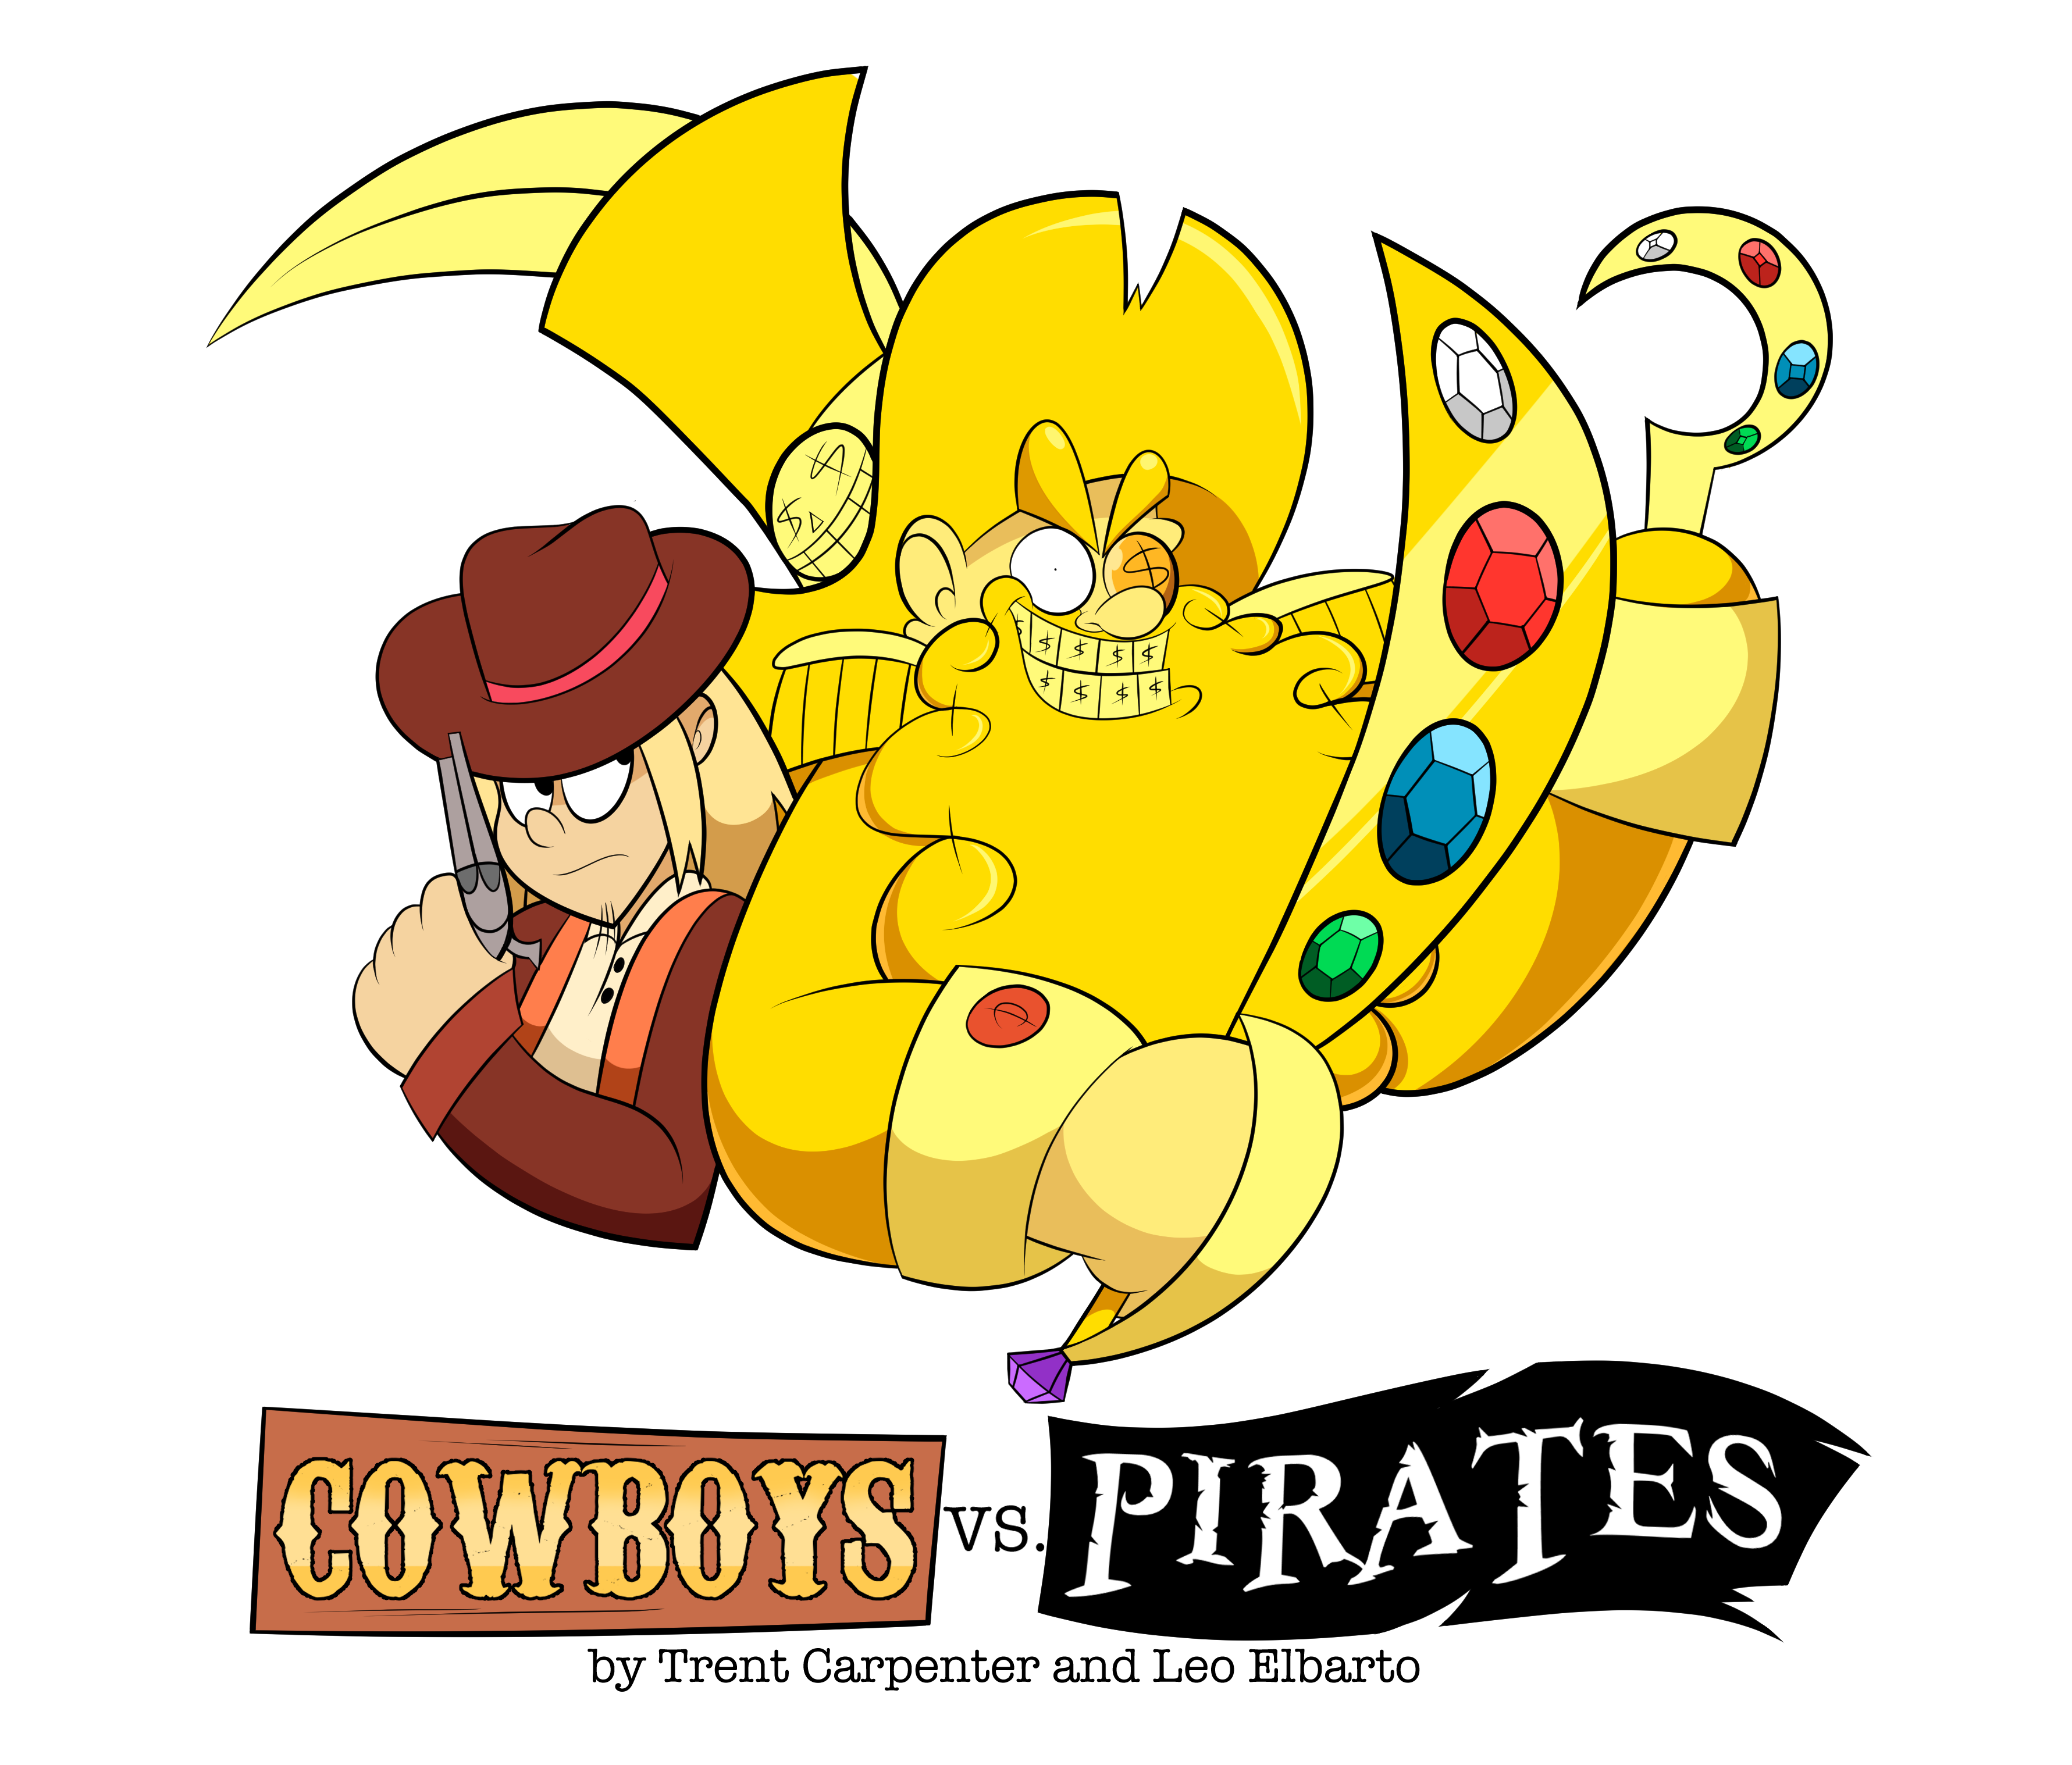 Cowboys vs. Pirates